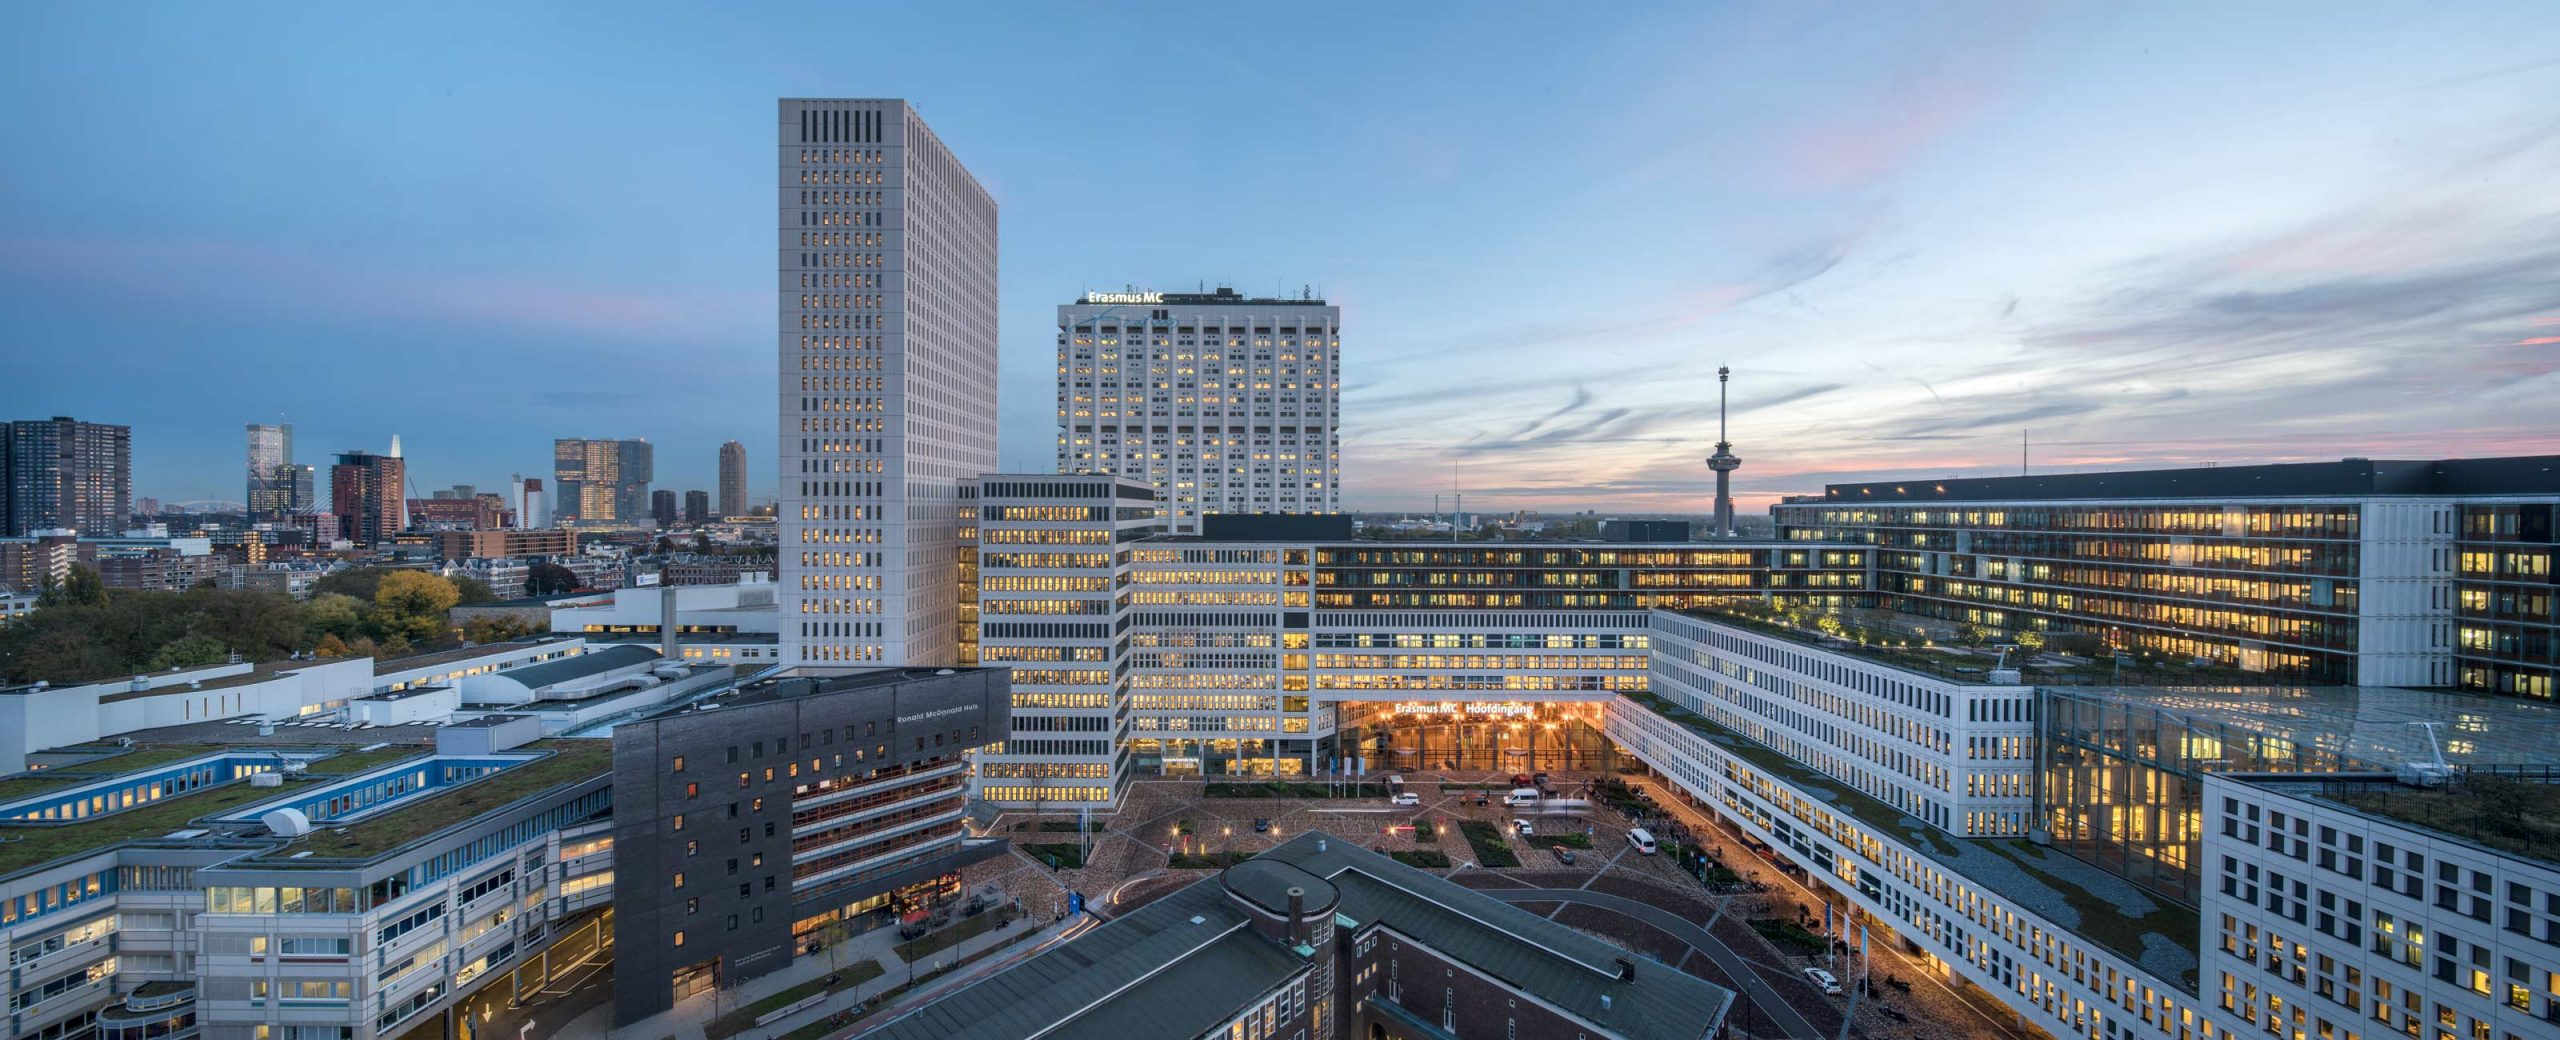 Erasmus University Medical Center based in Rotterdam, Netherlands